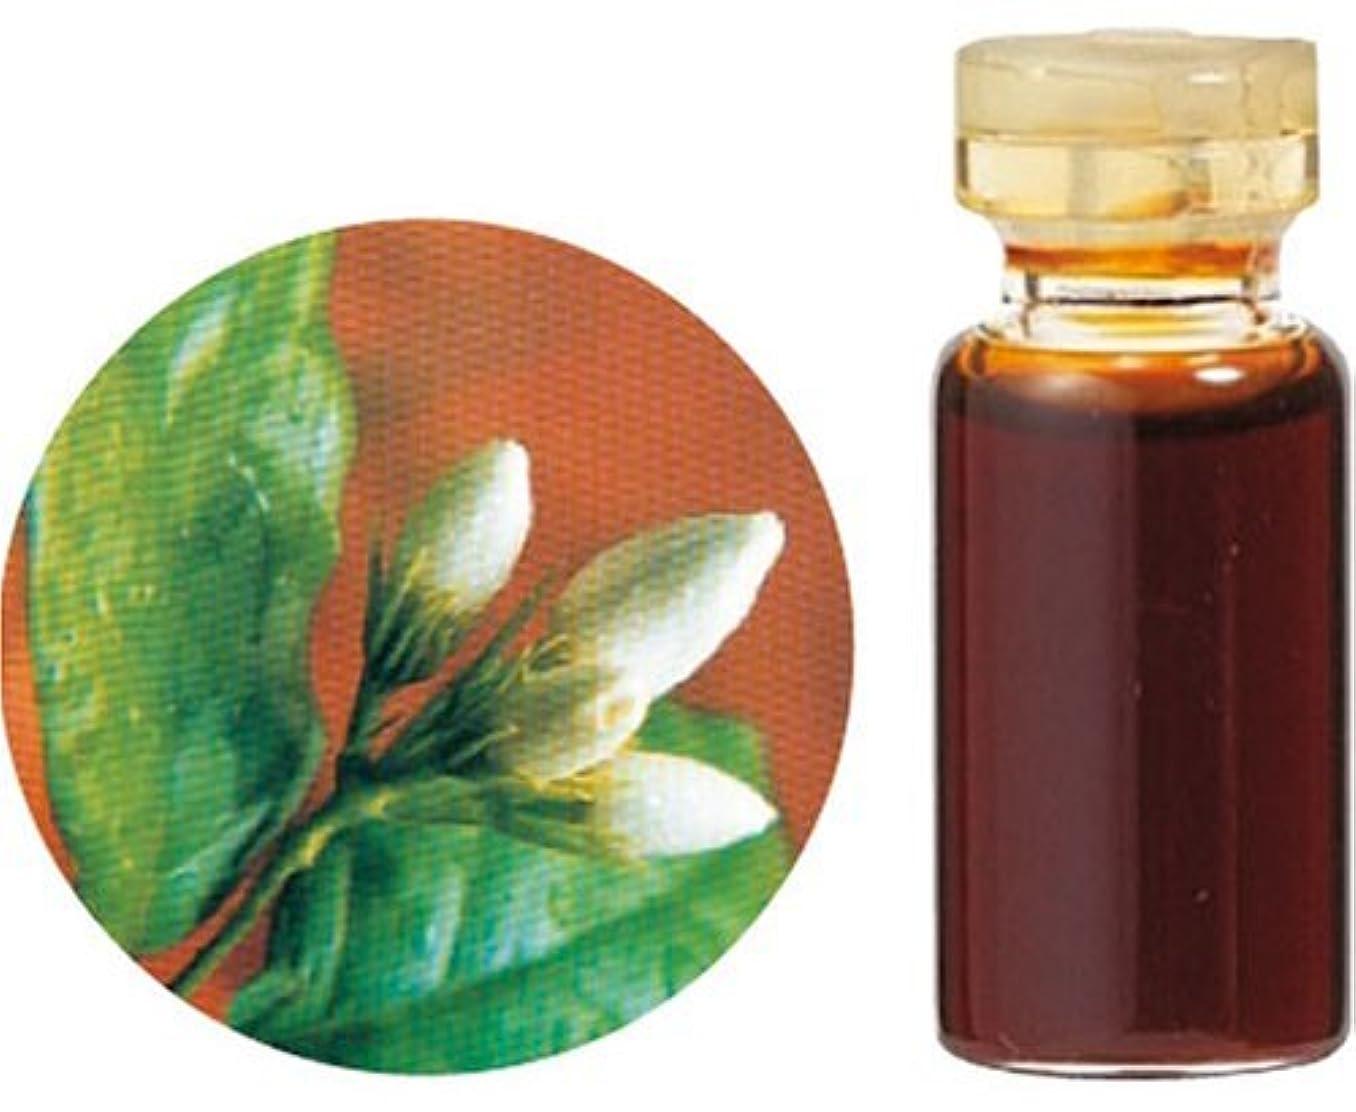 HerbalLife ジャスミンサンバックAbs 1ml